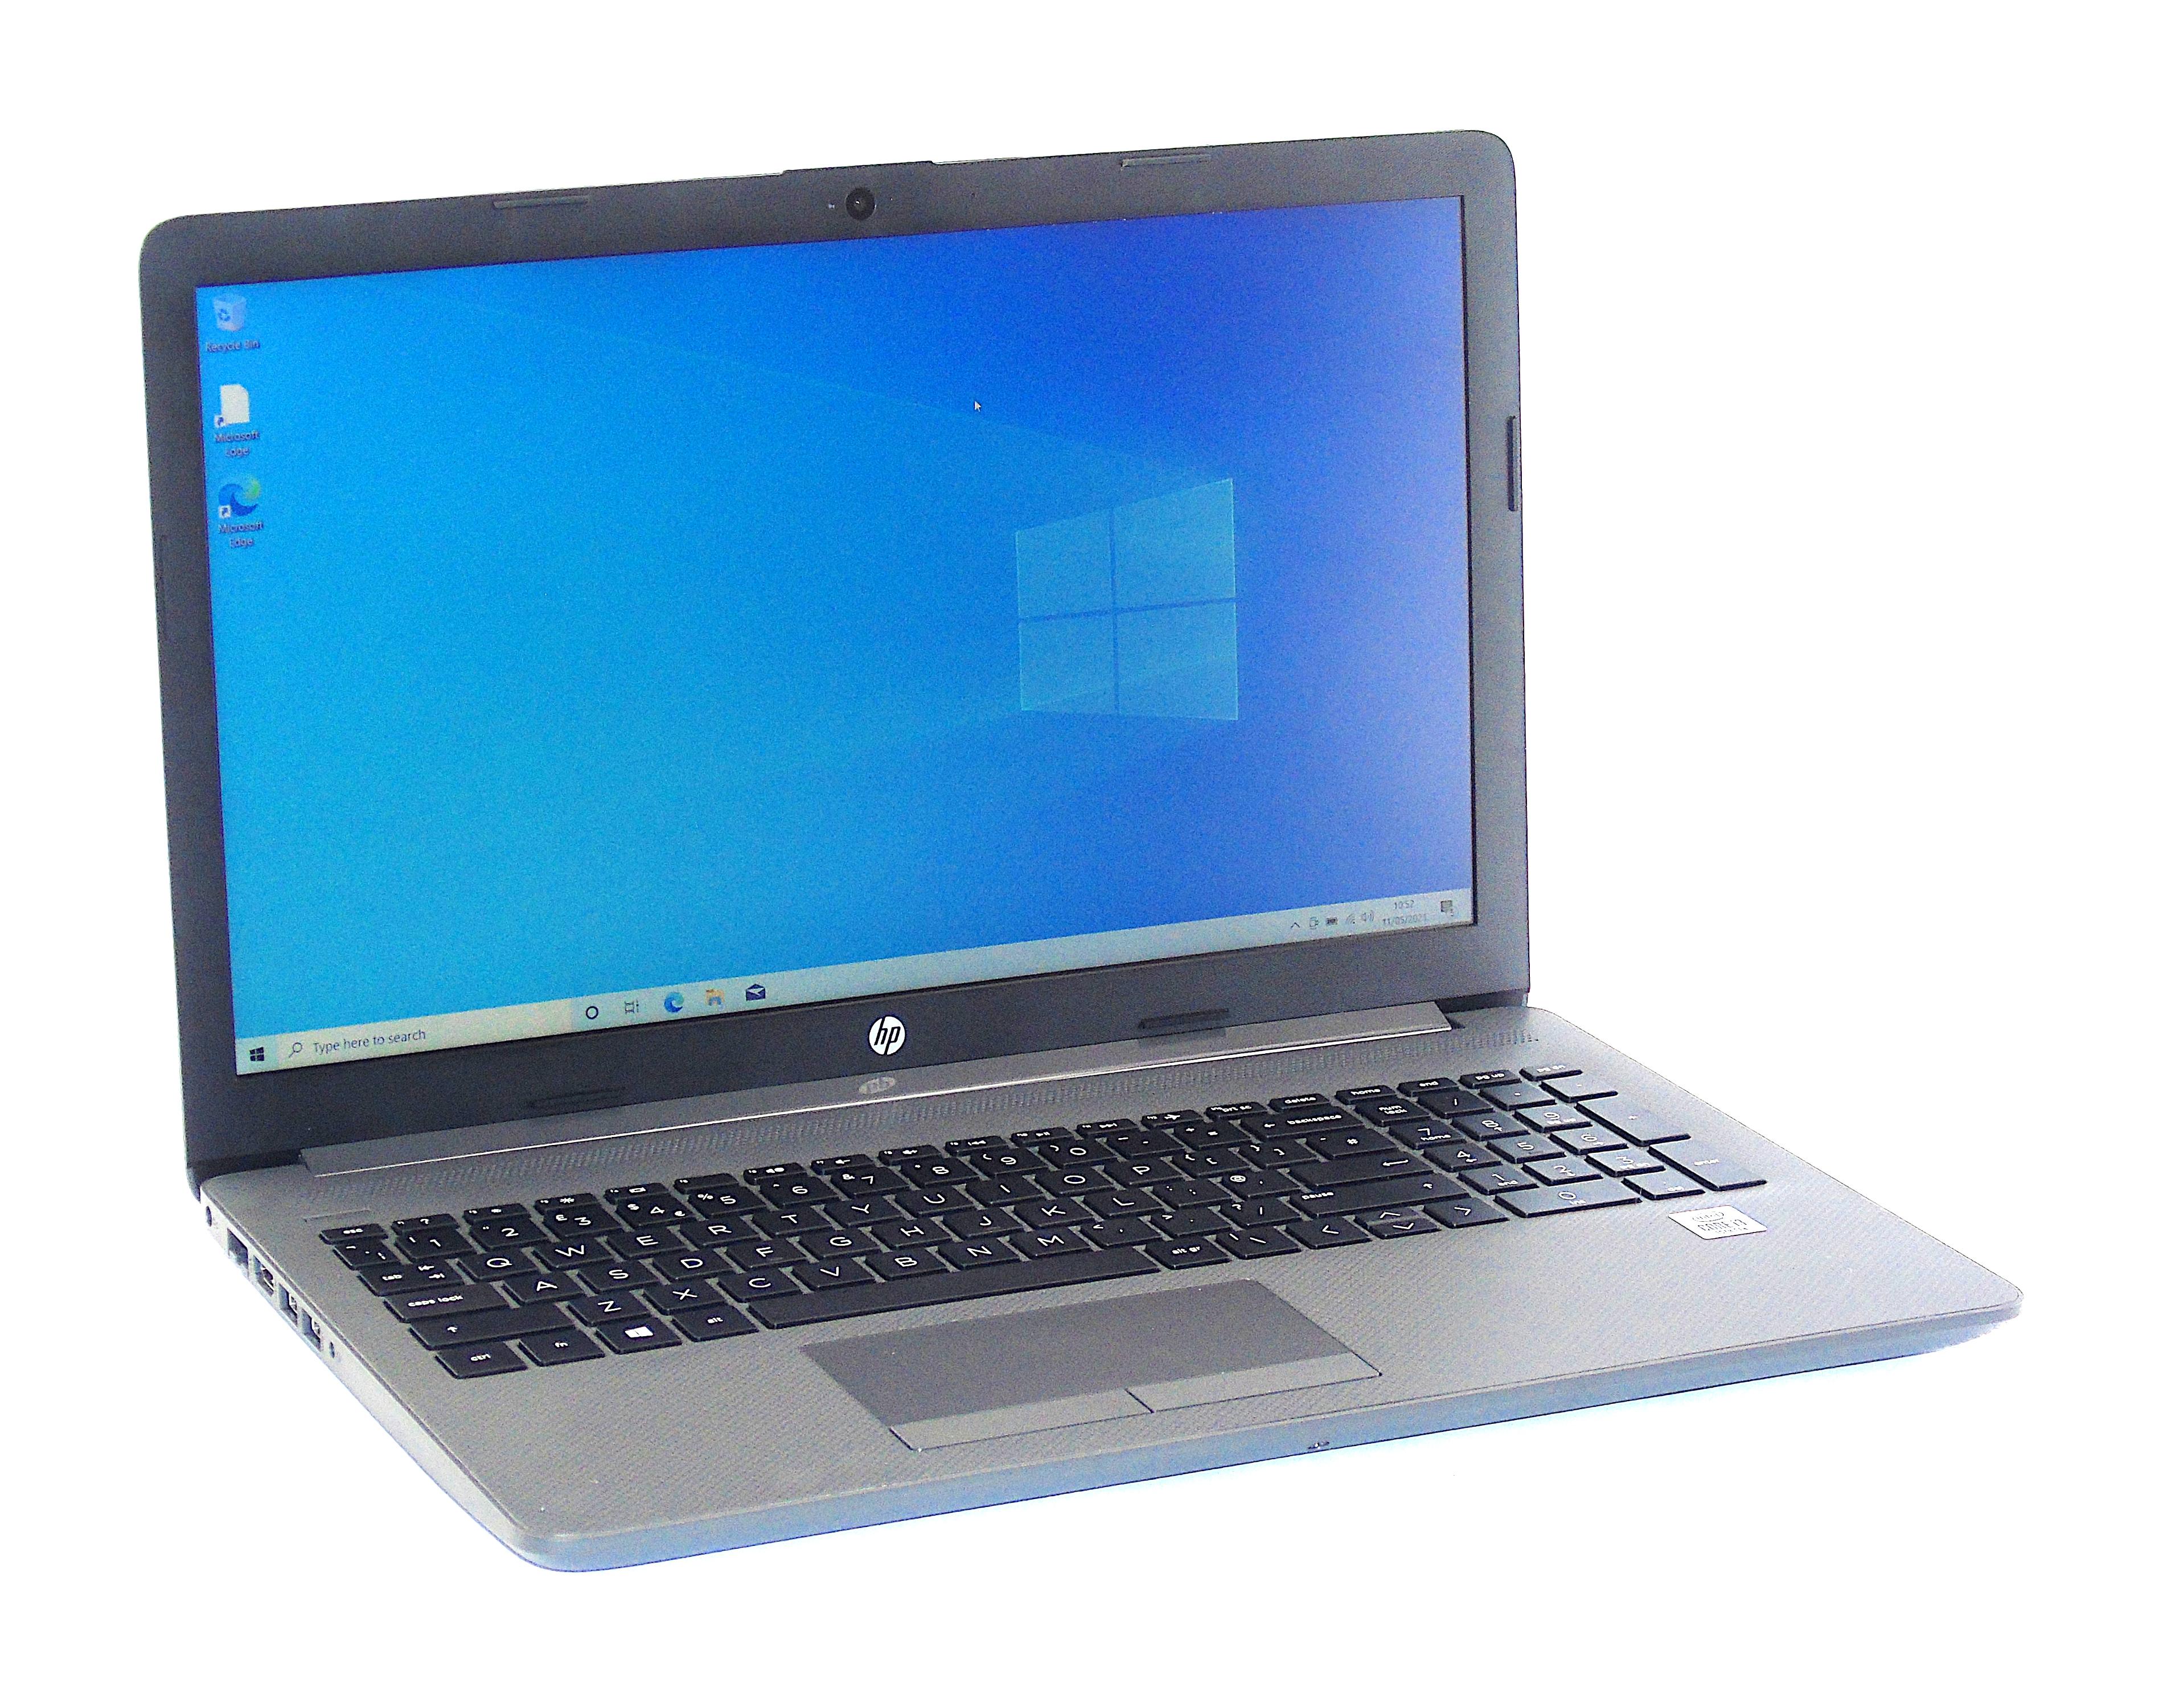 "HP 250 G7 Intel Core i3-1005G1 8GB RAM 256GB SSD 15.6"" FHD Display Windows 10"